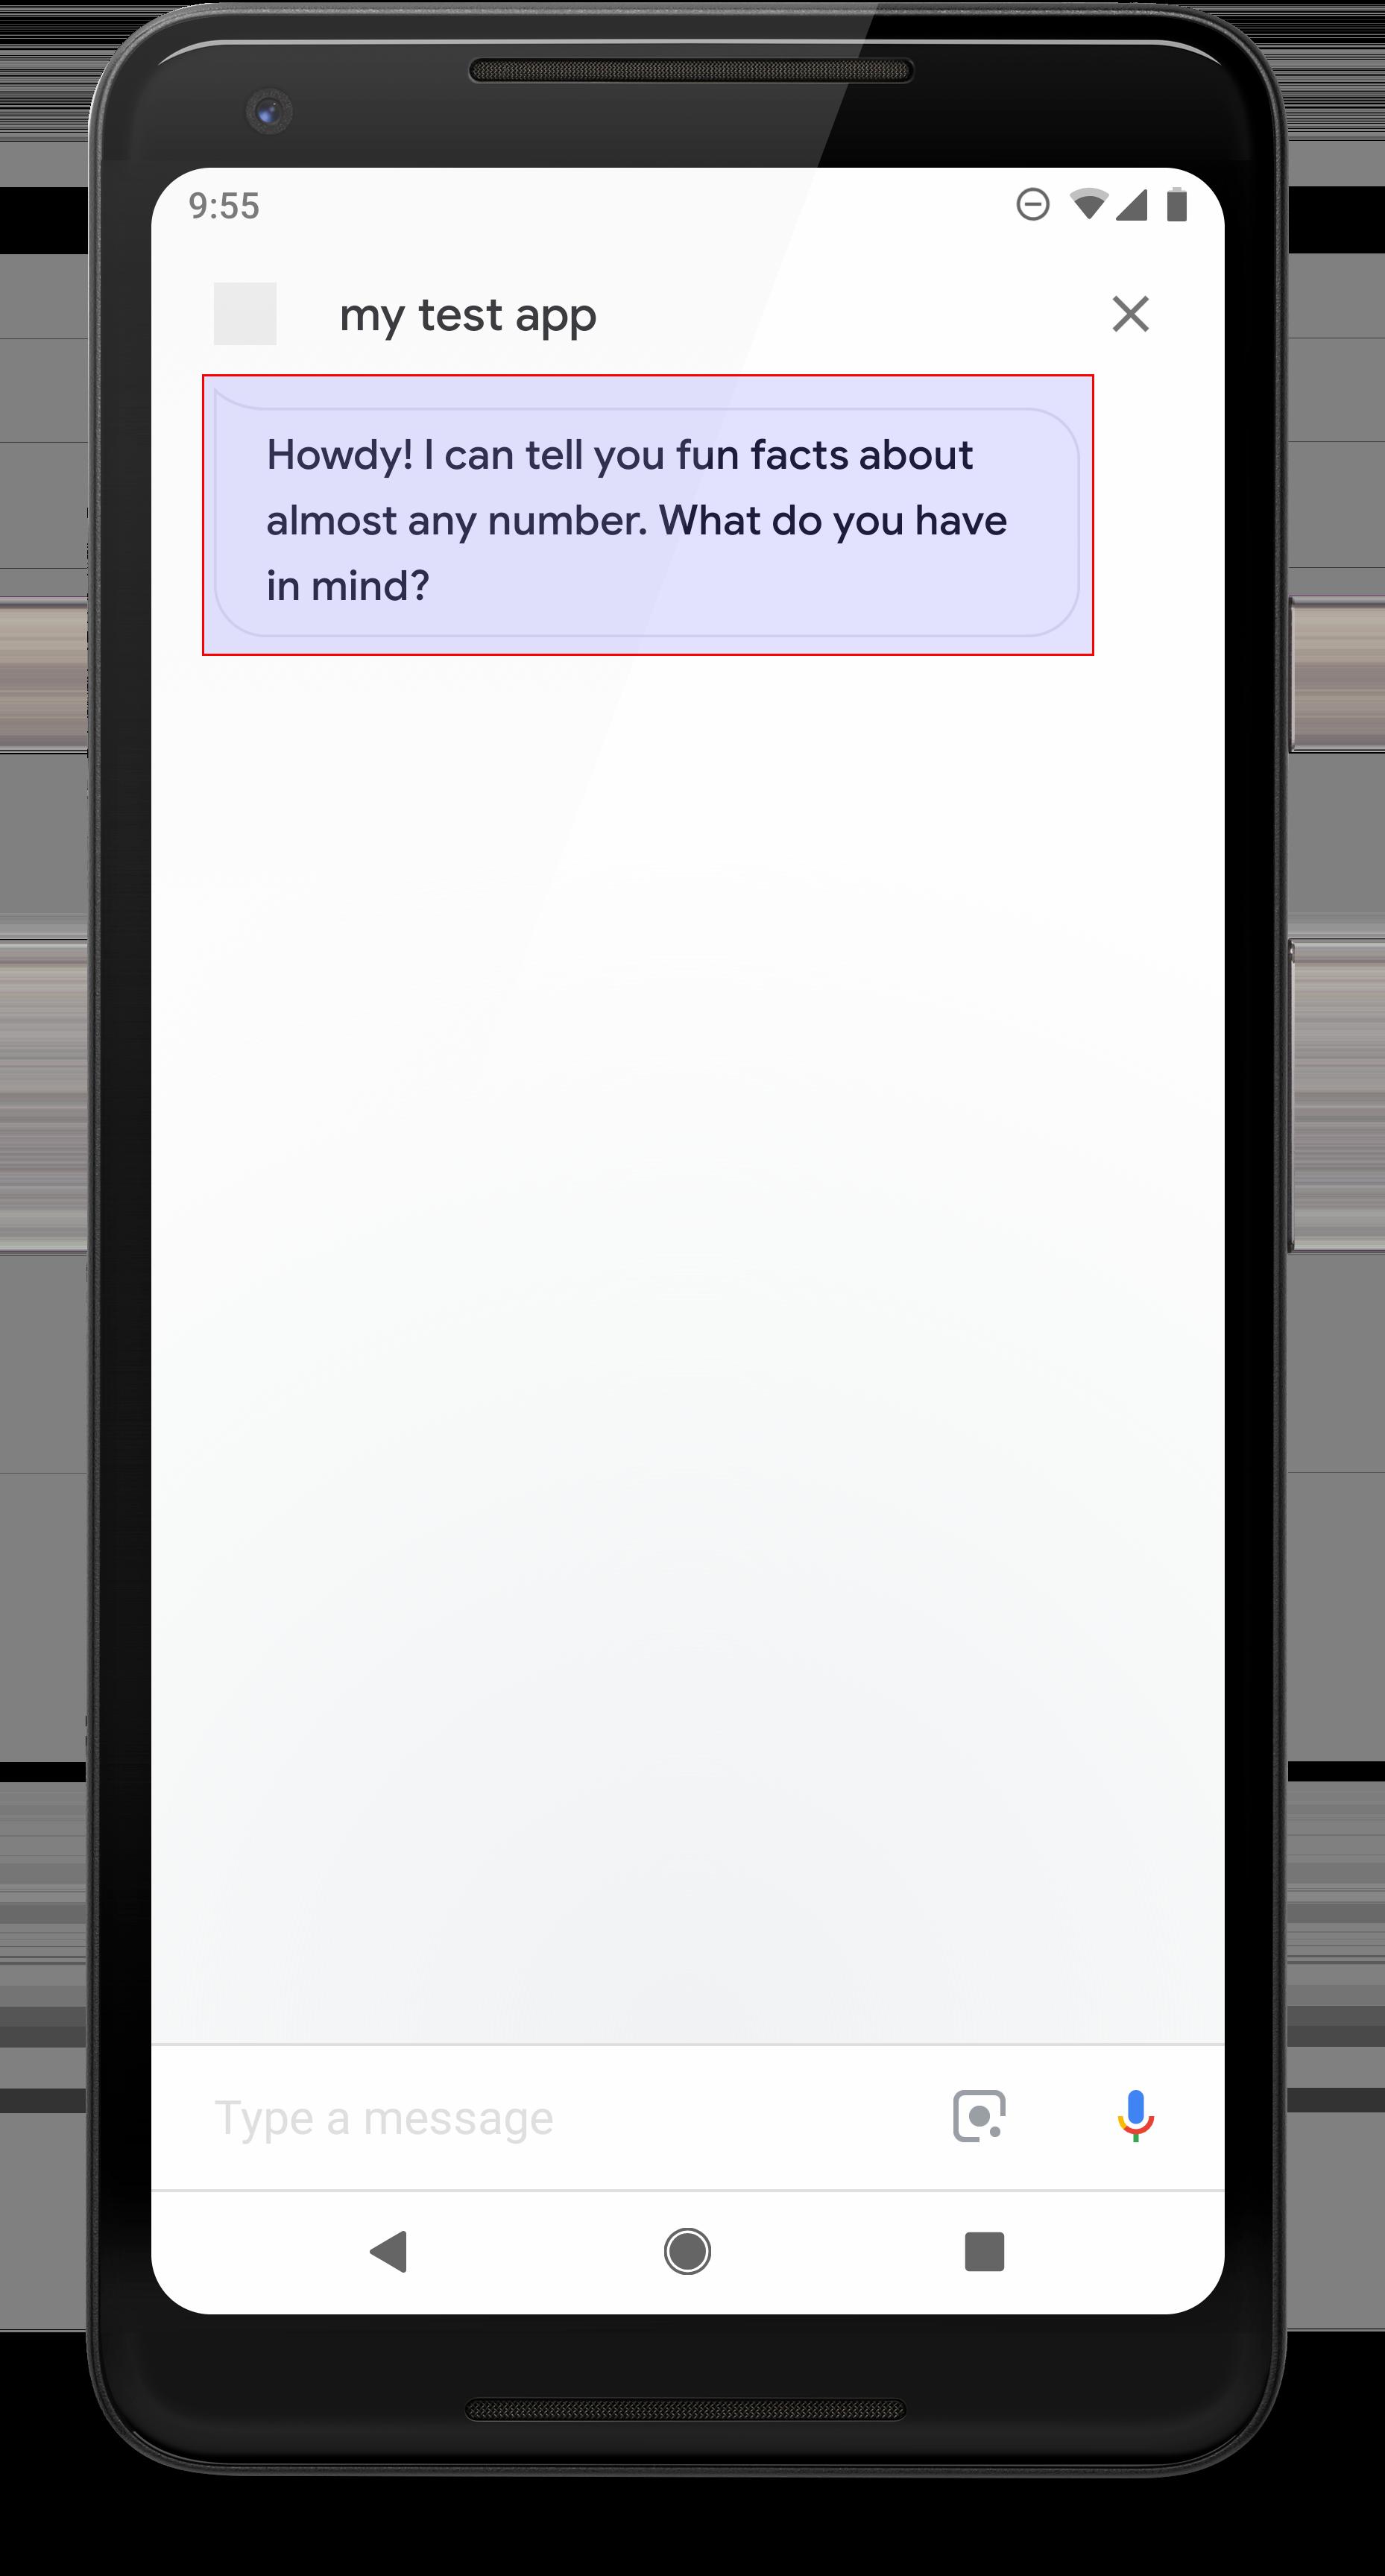 Responses | Conversational Actions | Google Developers